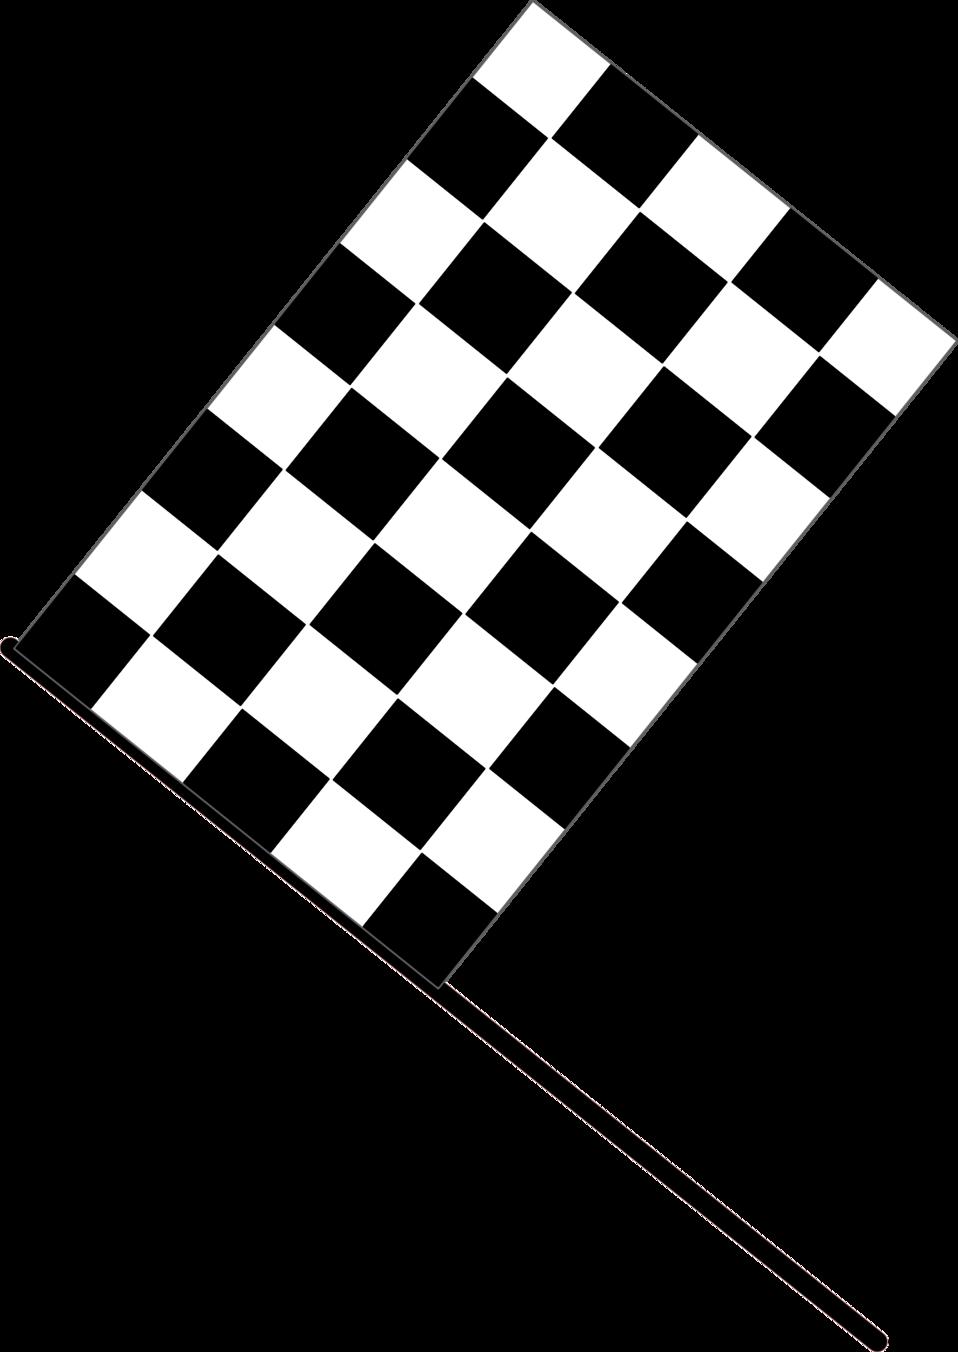 png freeuse download Public Domain Clip Art Image